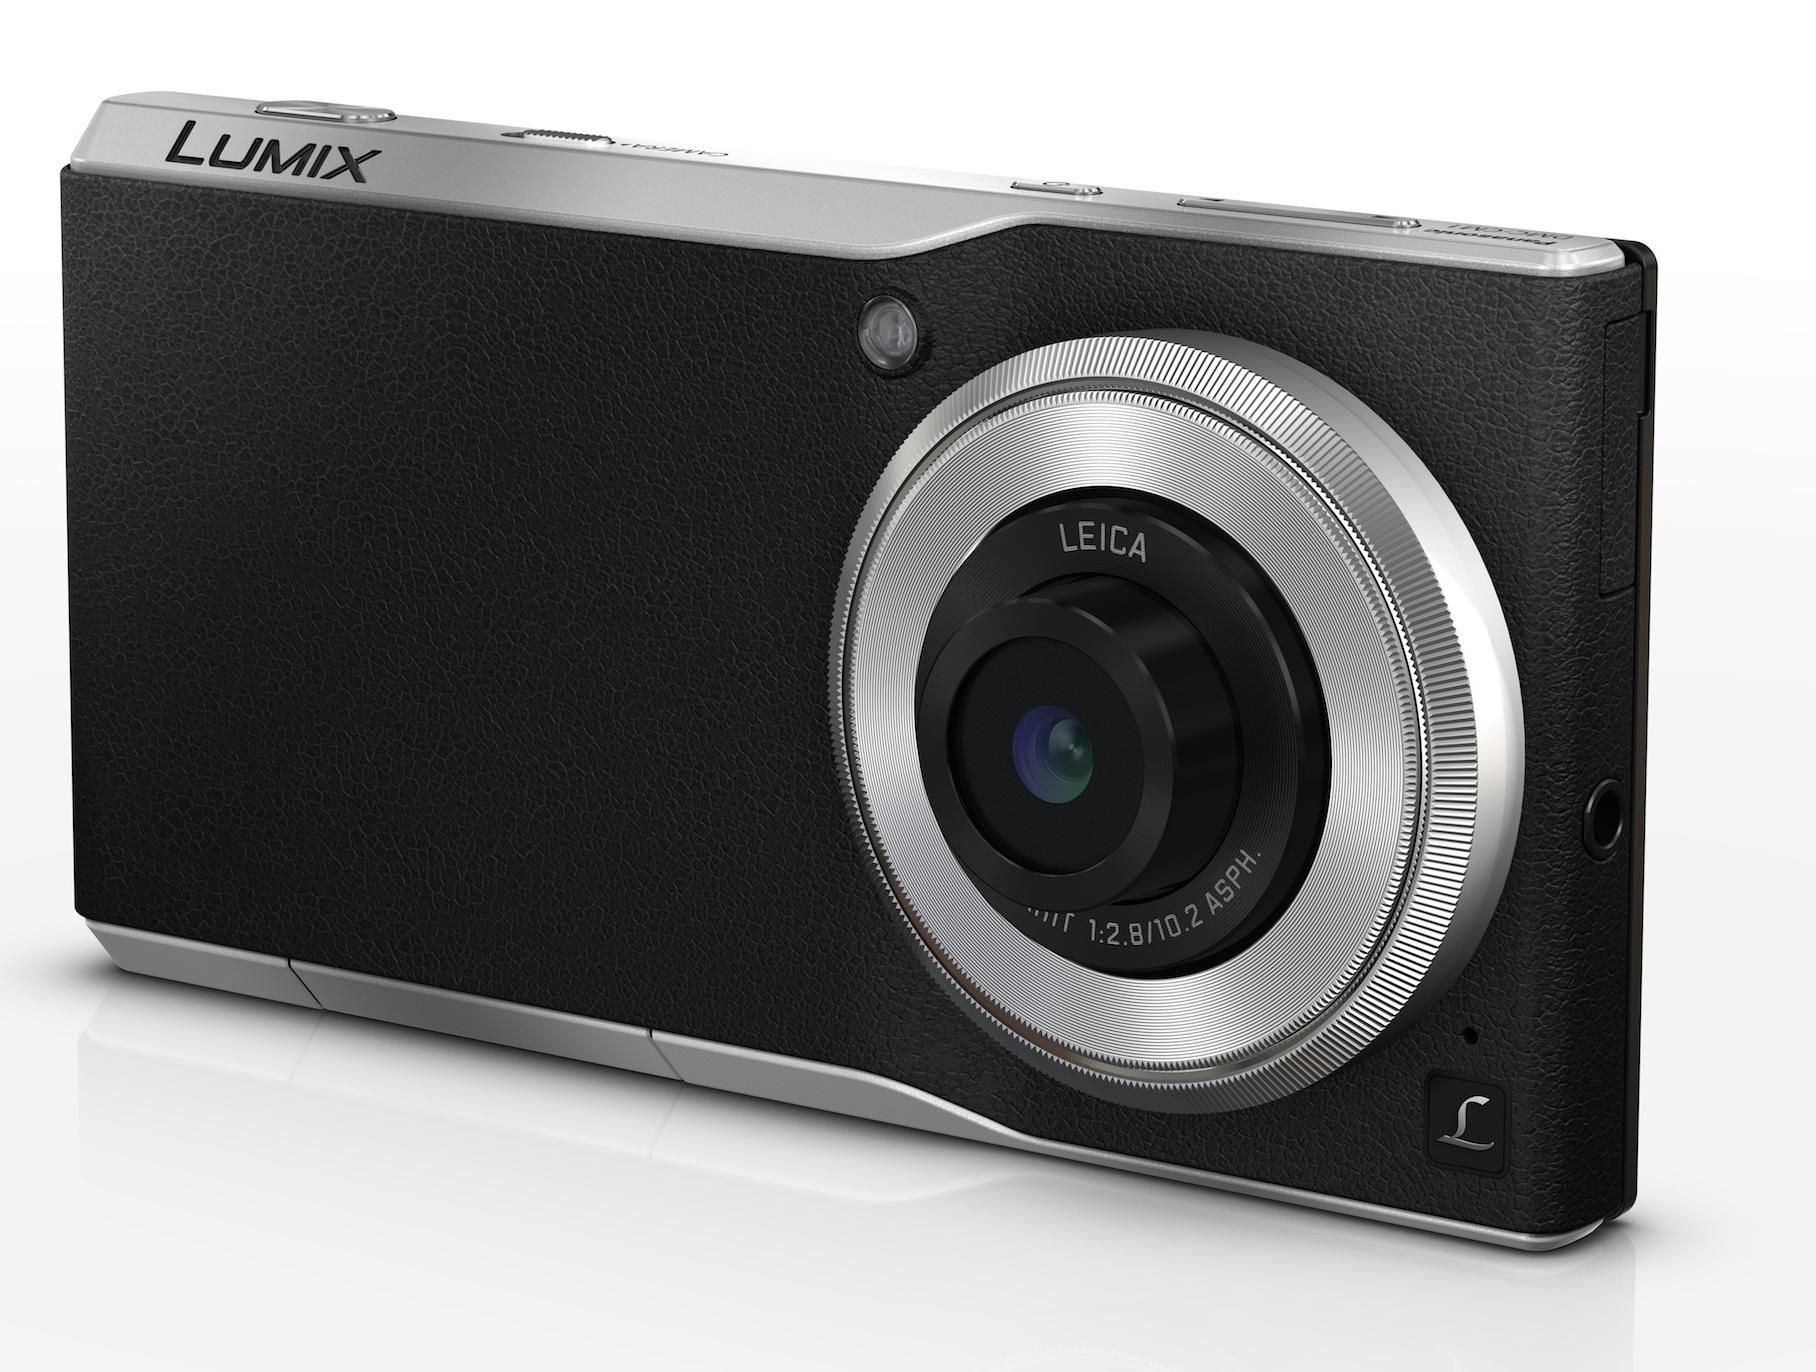 Panasonic Lumix Camera Phone